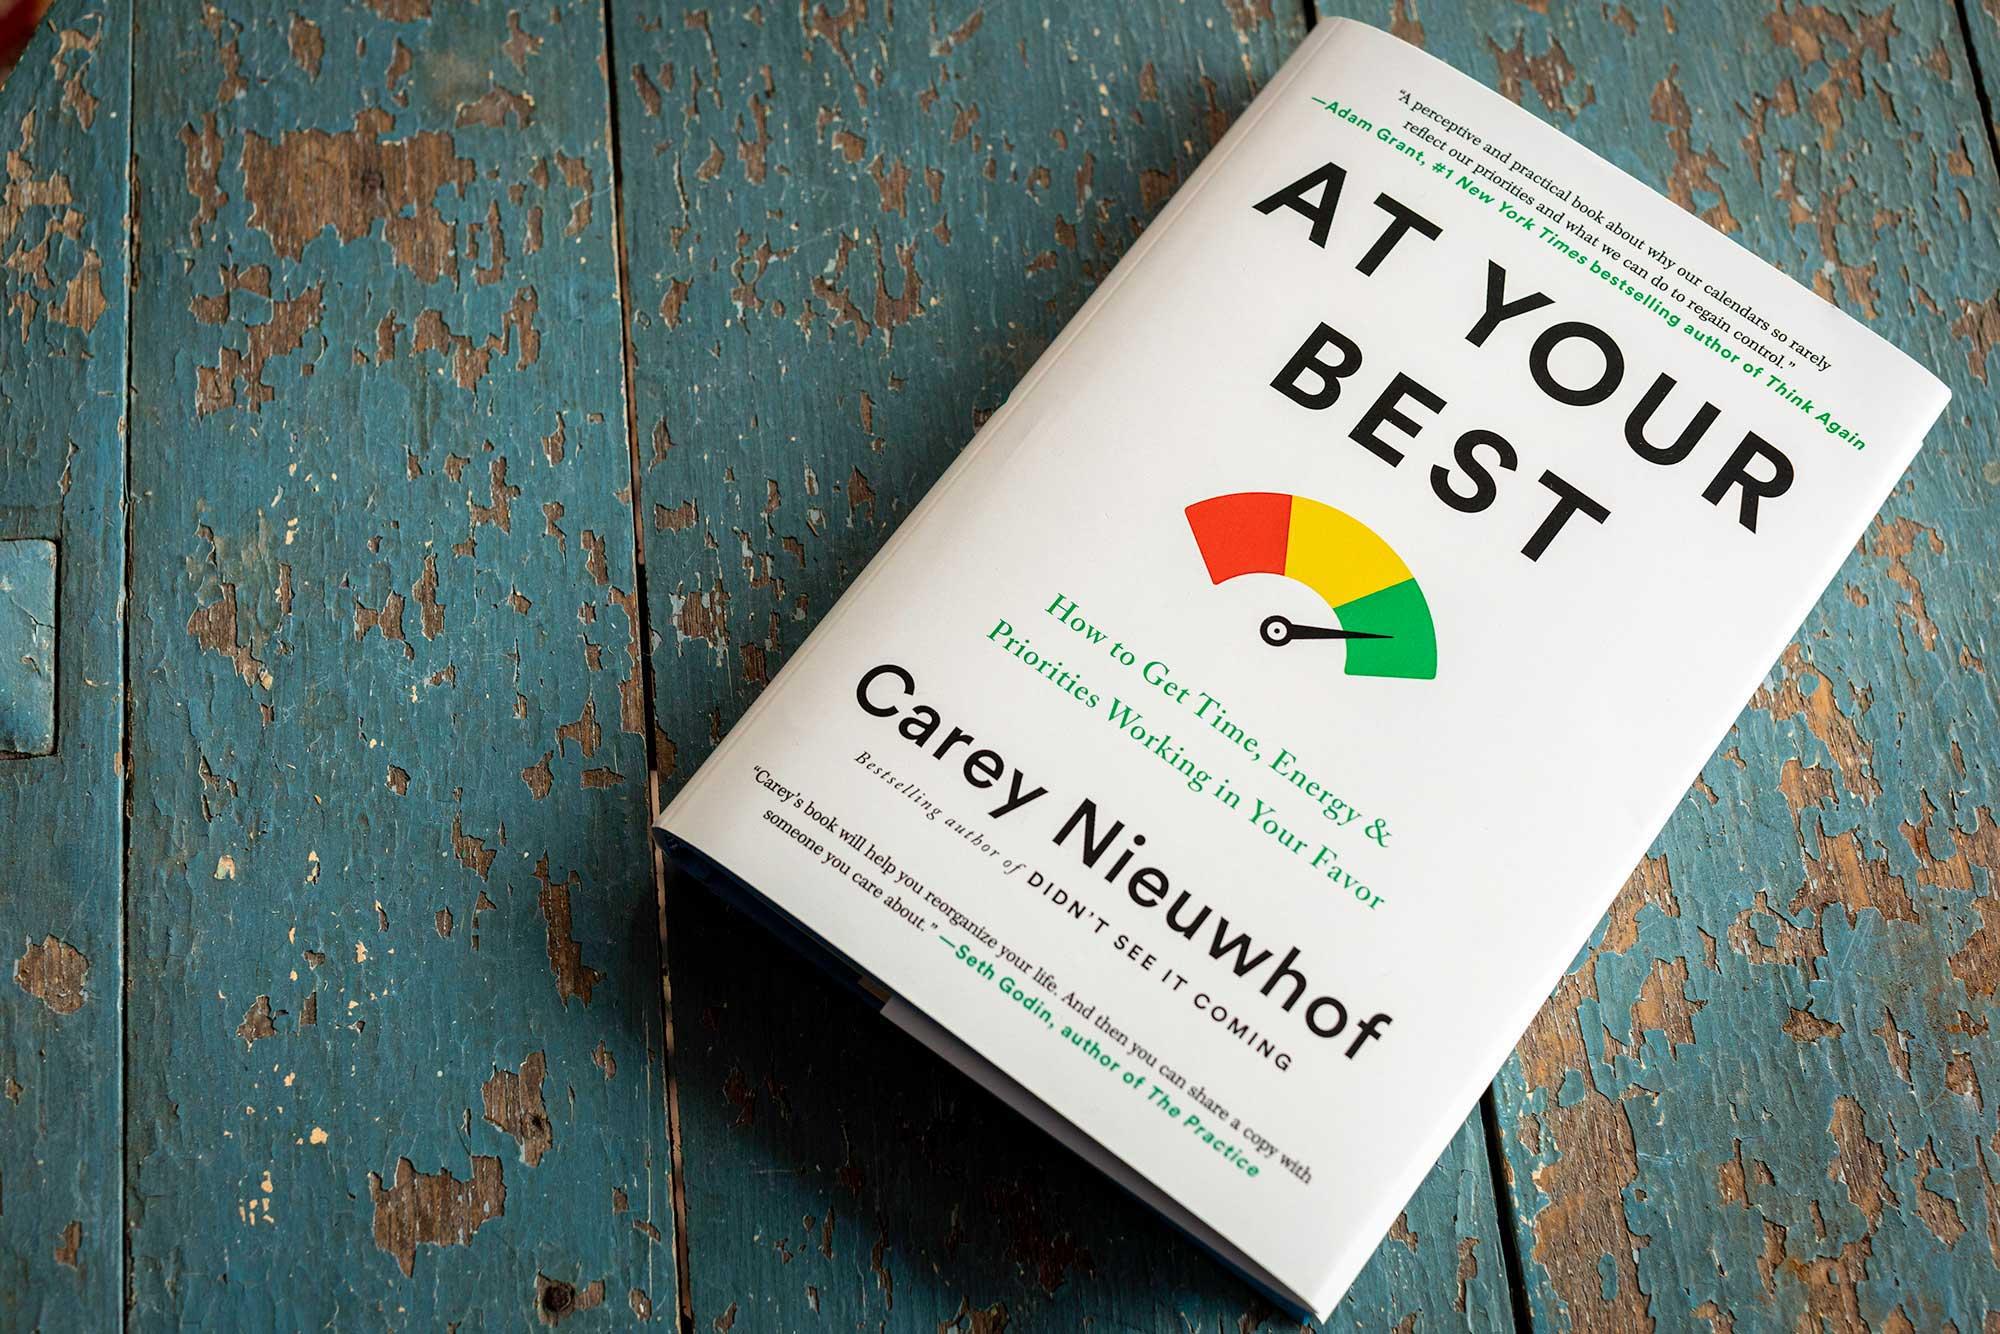 carey-nieuwhof-at-your-best